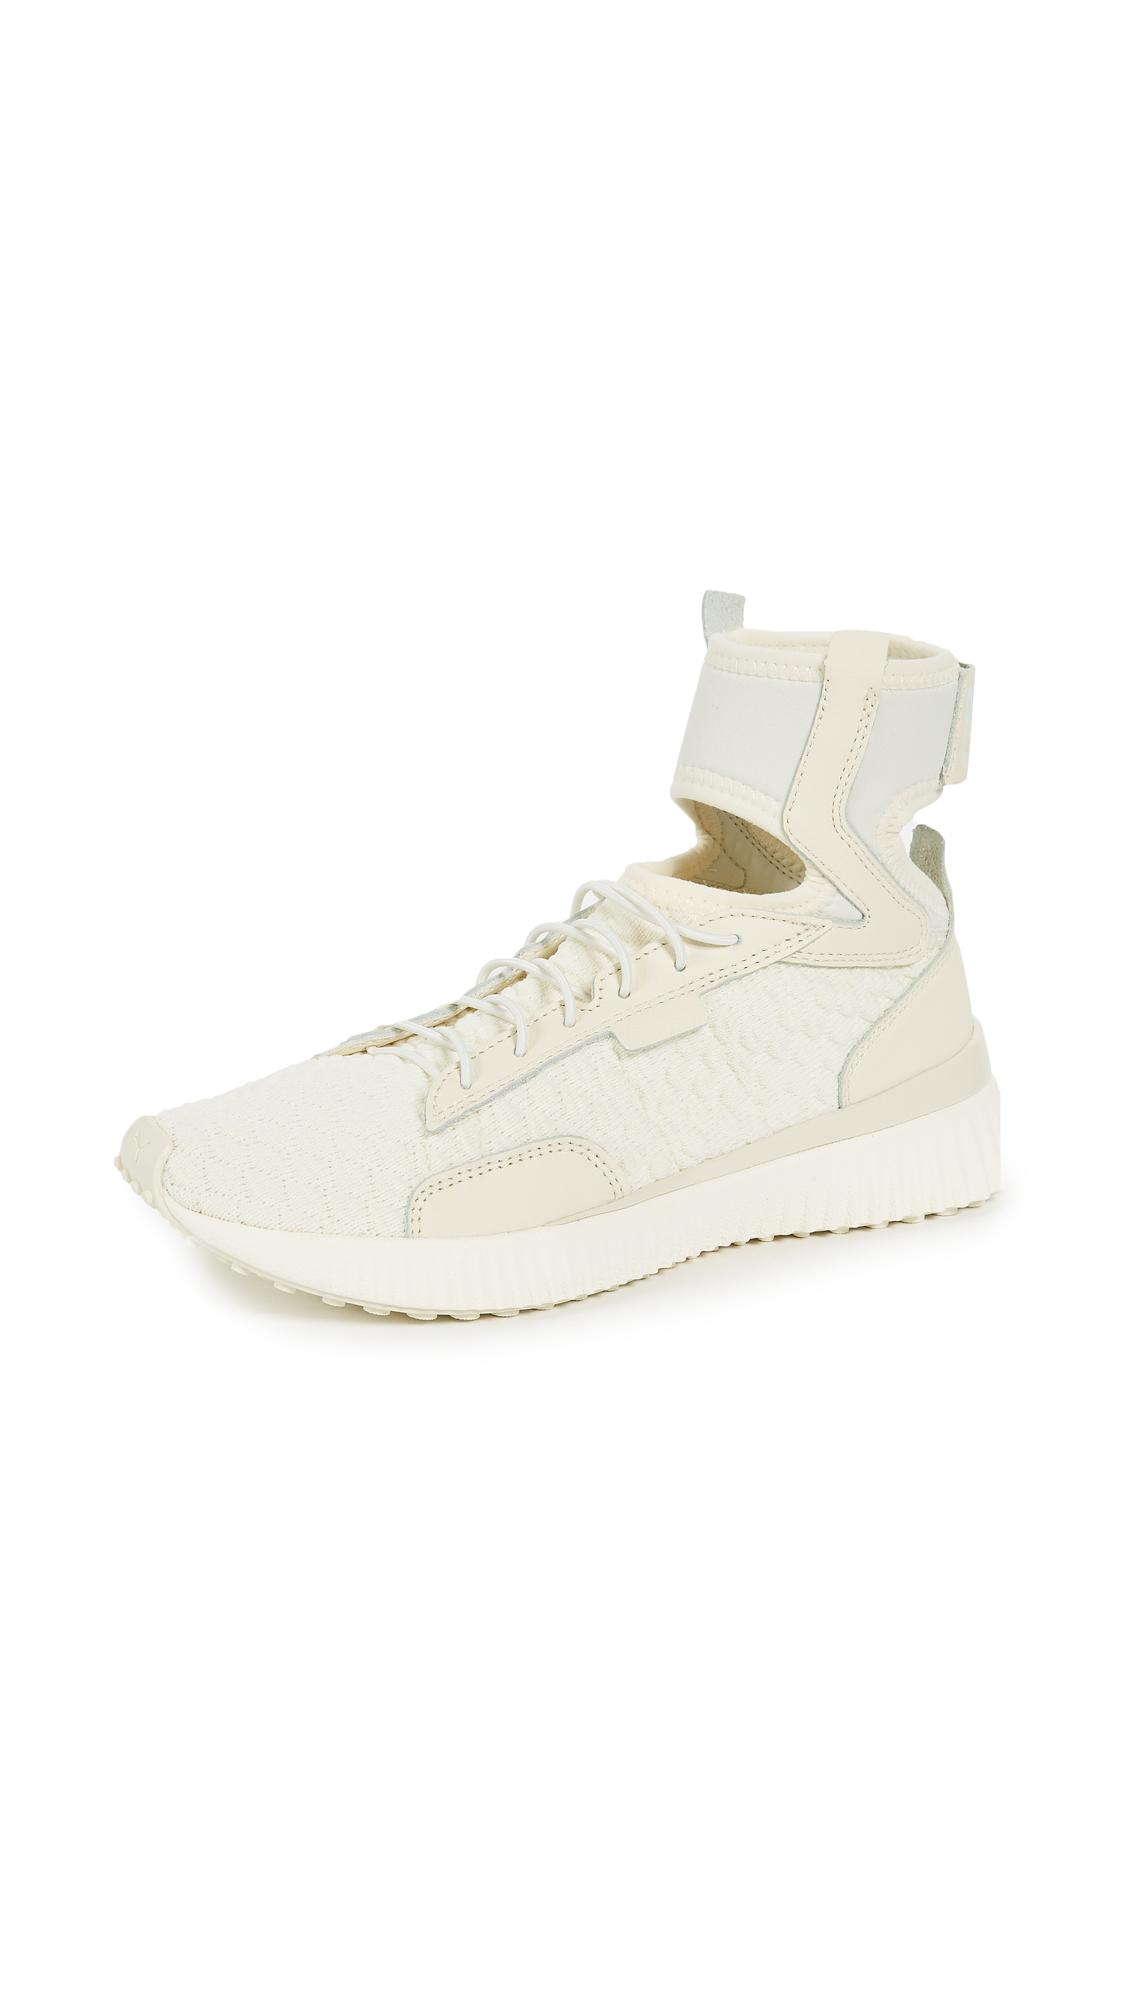 PUMA FENTY x PUMA Trainer Mid Geo Sneakers - Vanilla Ice/Sterling Blue